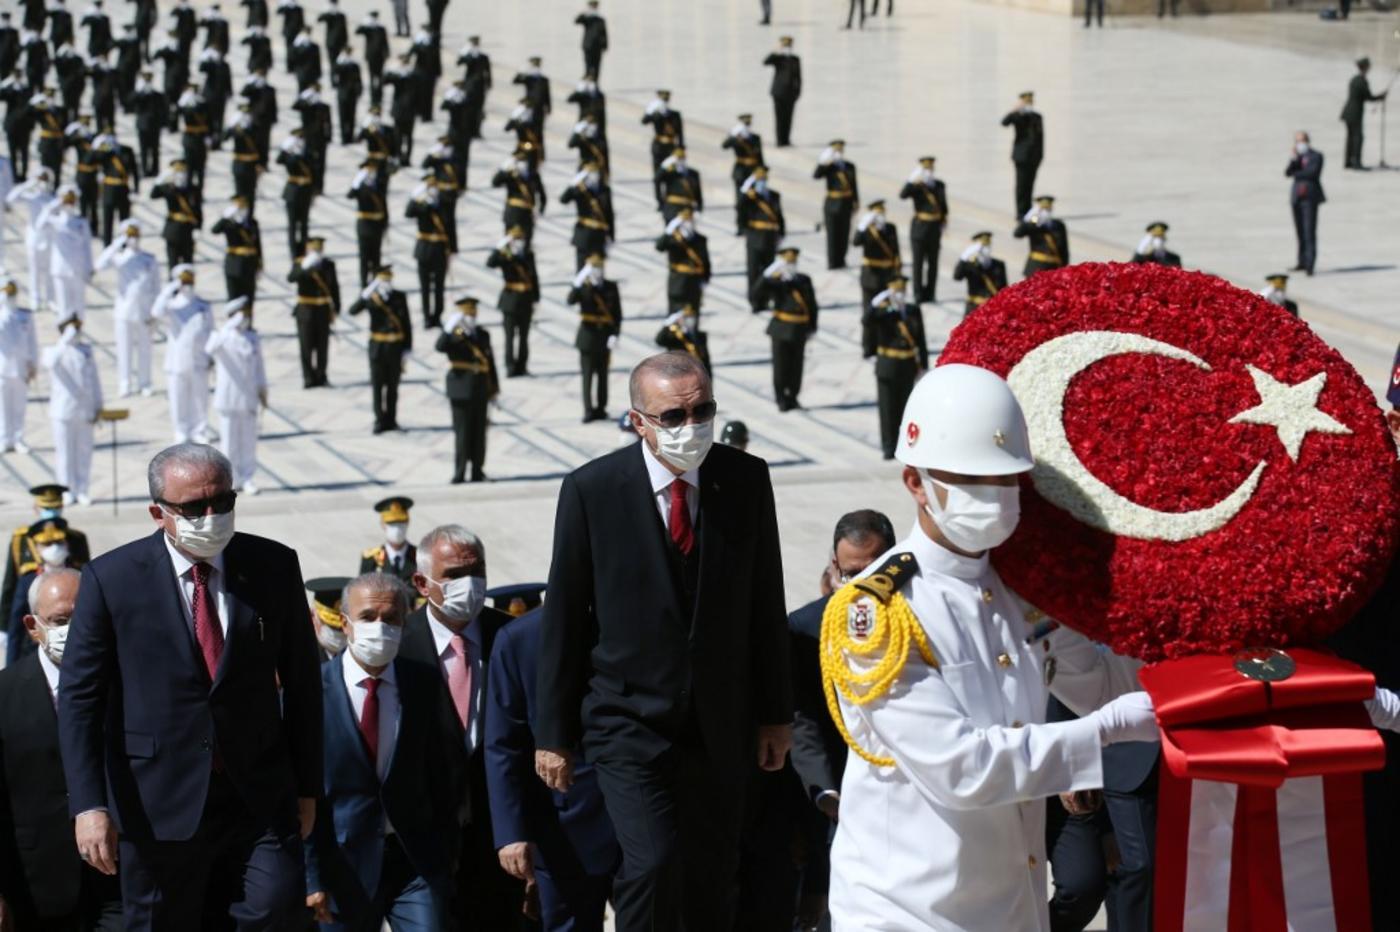 Erdogan's 'New Turkey' narrative is no longer selling | Middle East Eye